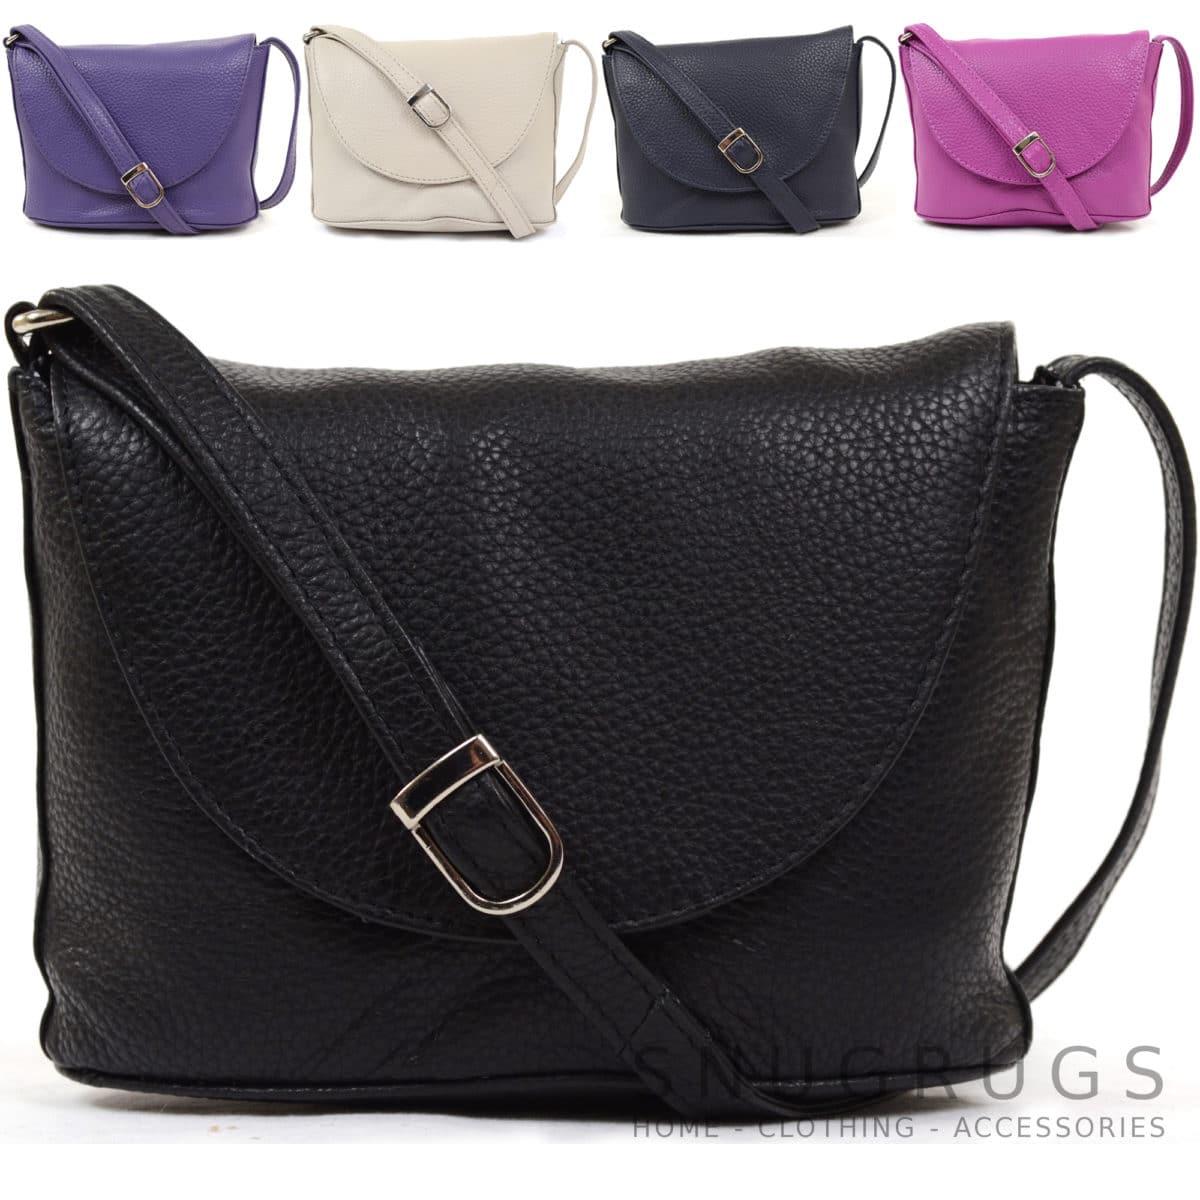 Greta – Soft Leather Cross Body / Shoulder Bag